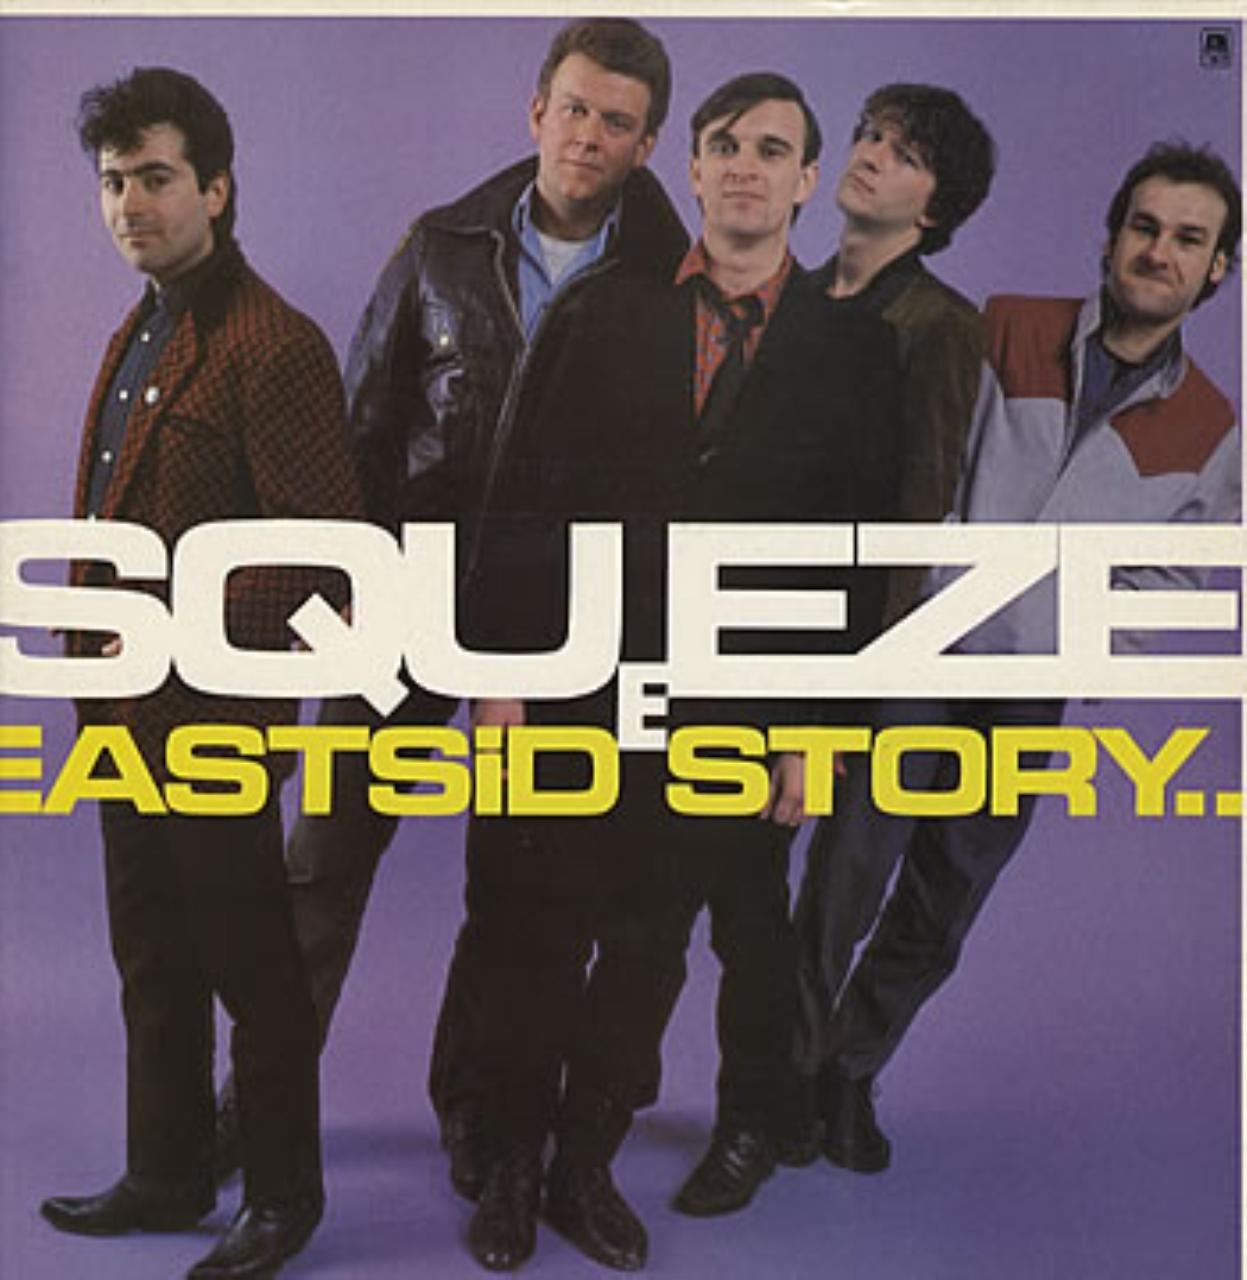 East Side Story